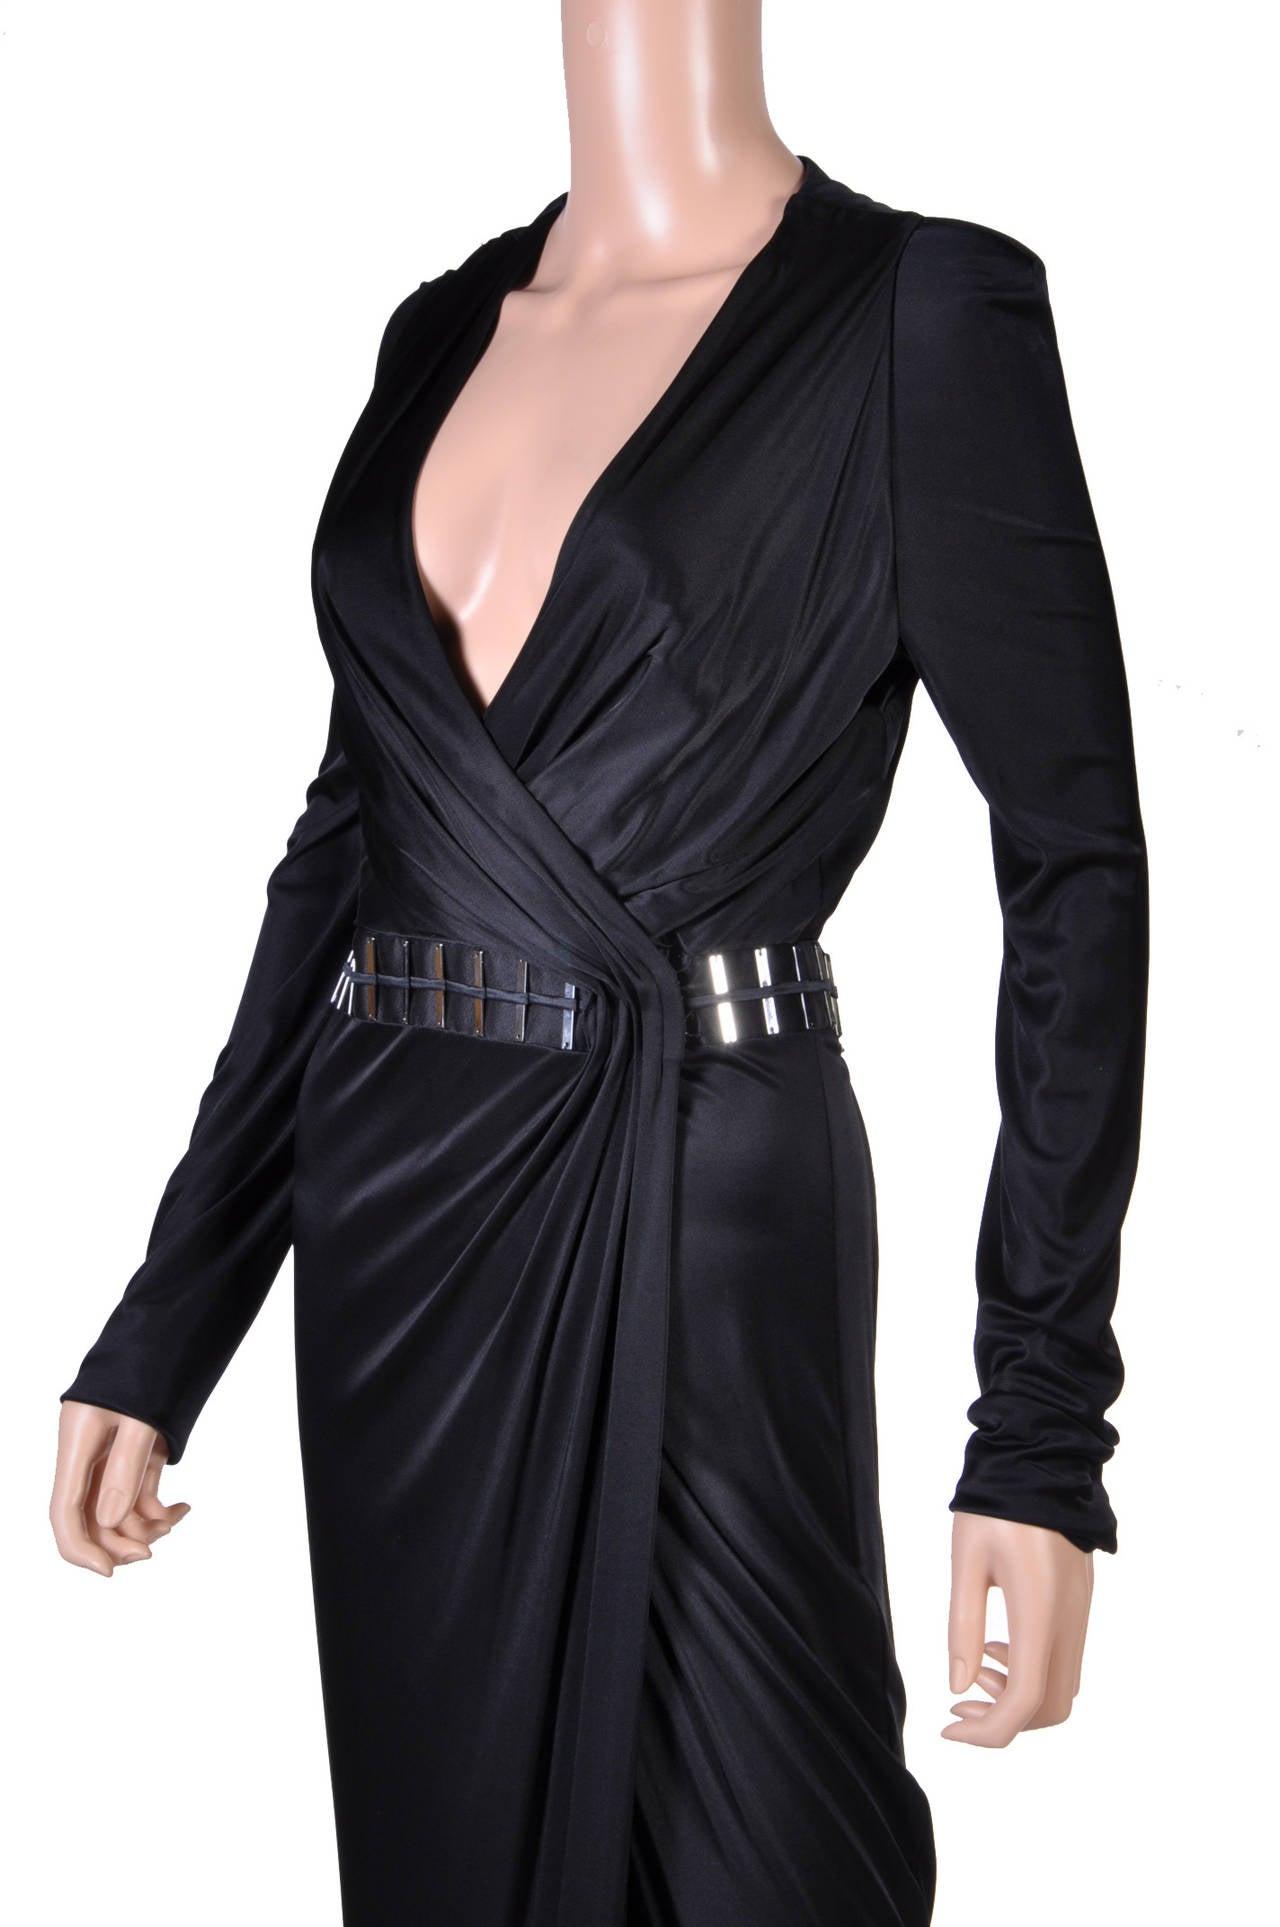 New VERSACE BLACK WRAP DRESS 4